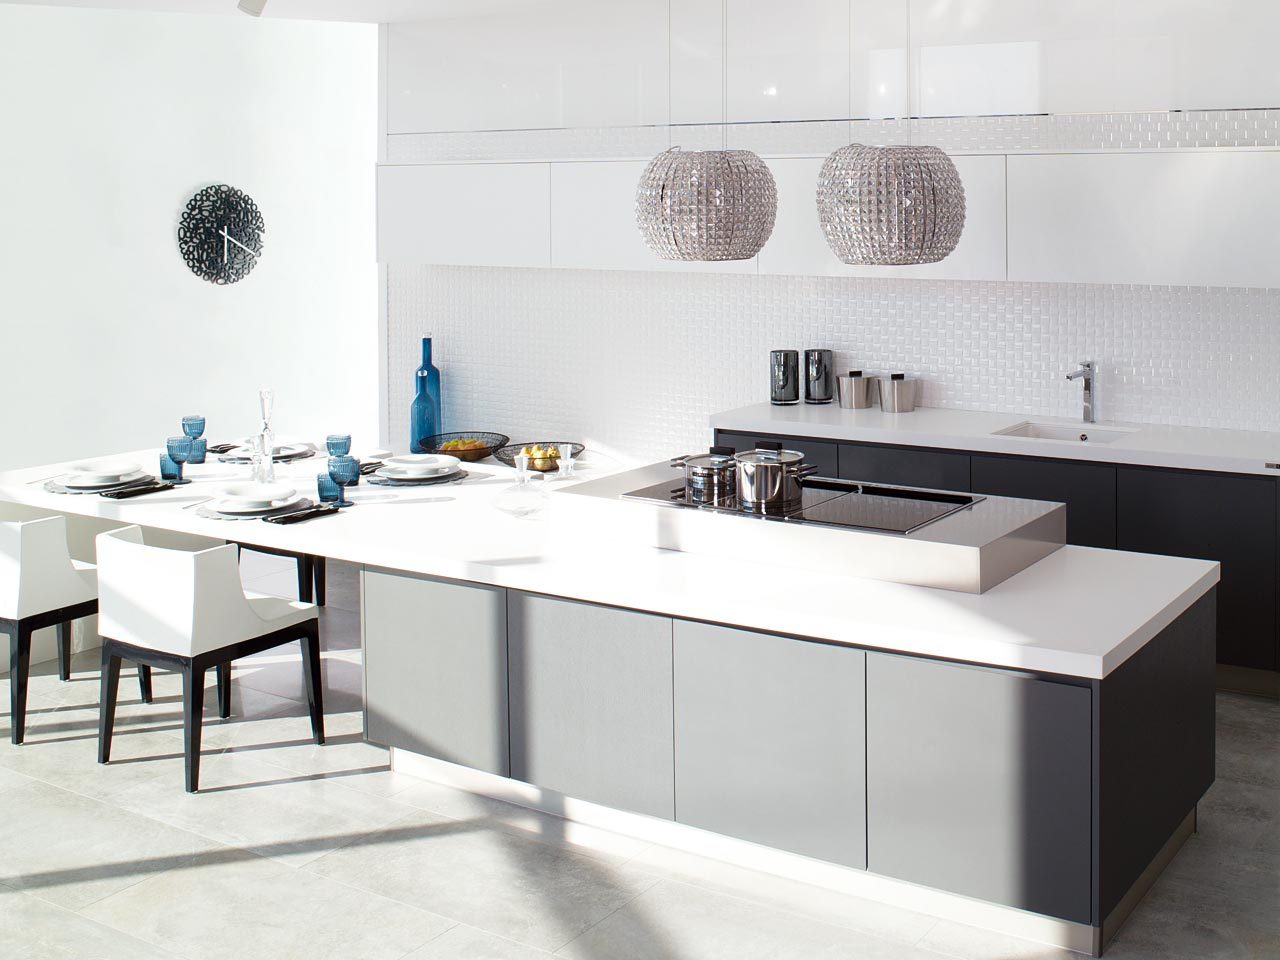 Cocina style contemporaneo color azul blanco gris negro - Lo ultimo en cocinas modernas ...